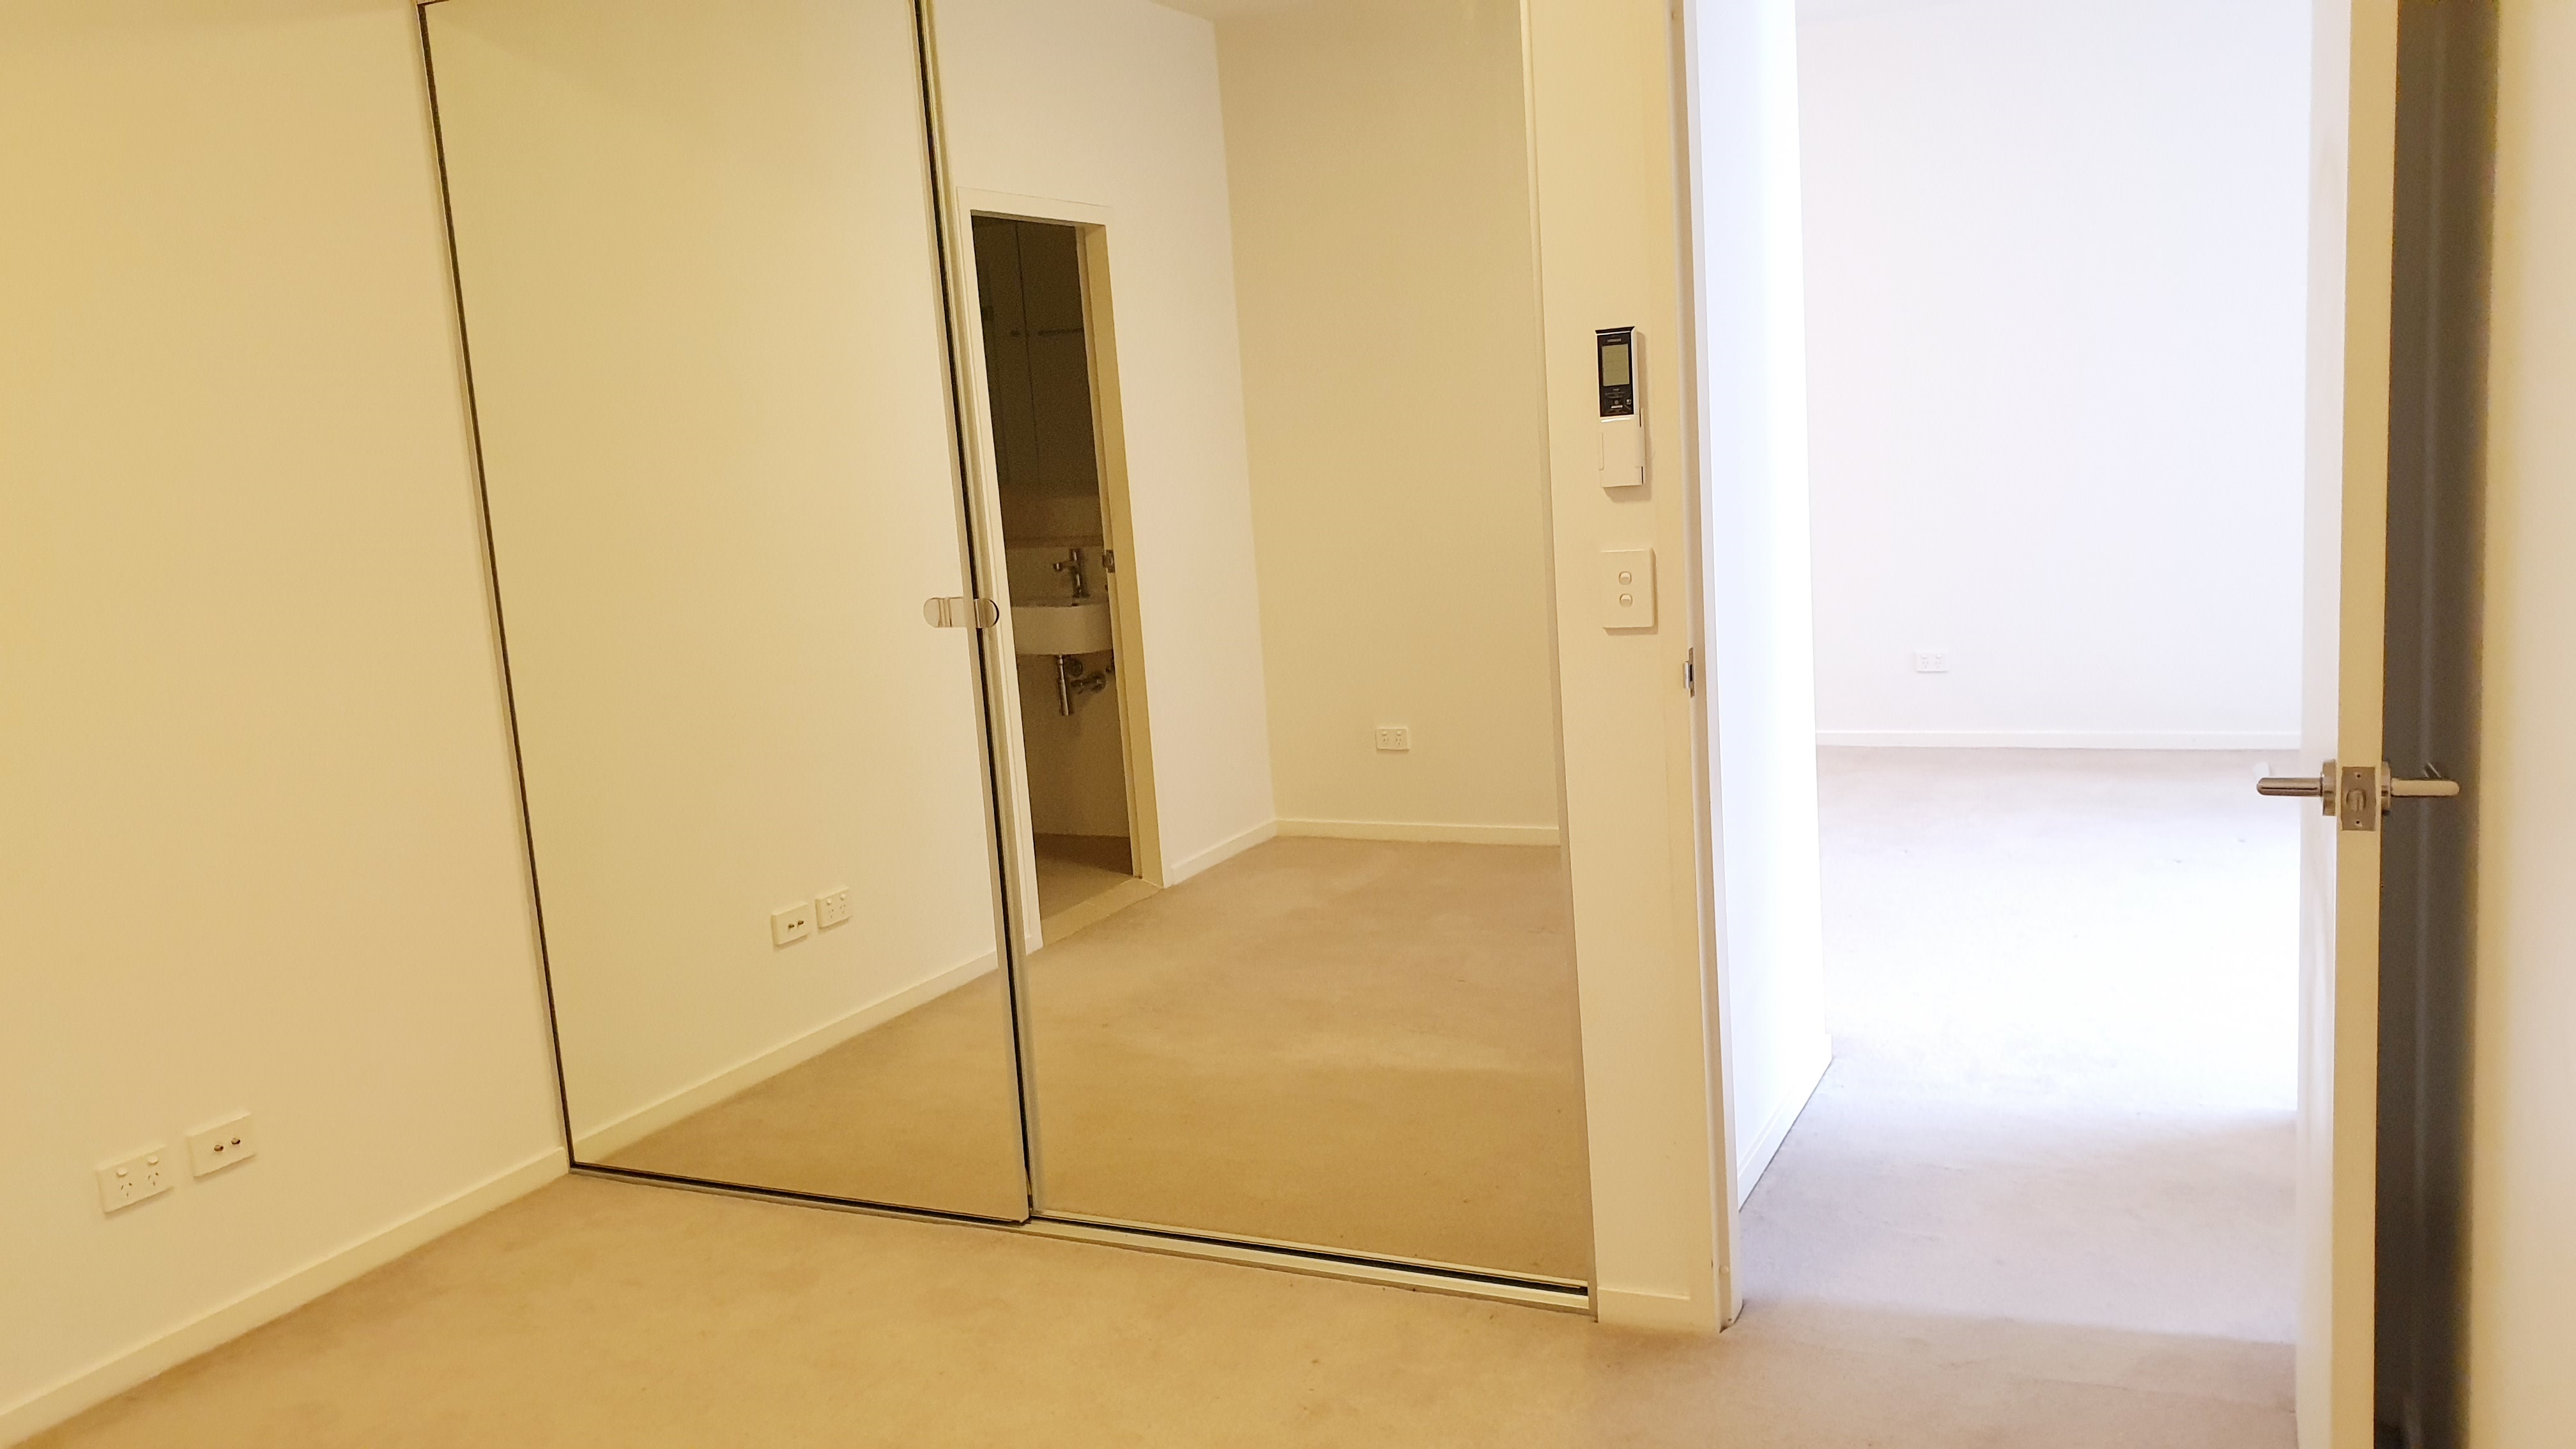 Image: 2 BEDROOM APARTMENT - HIGHPOINT HURSTVILLE